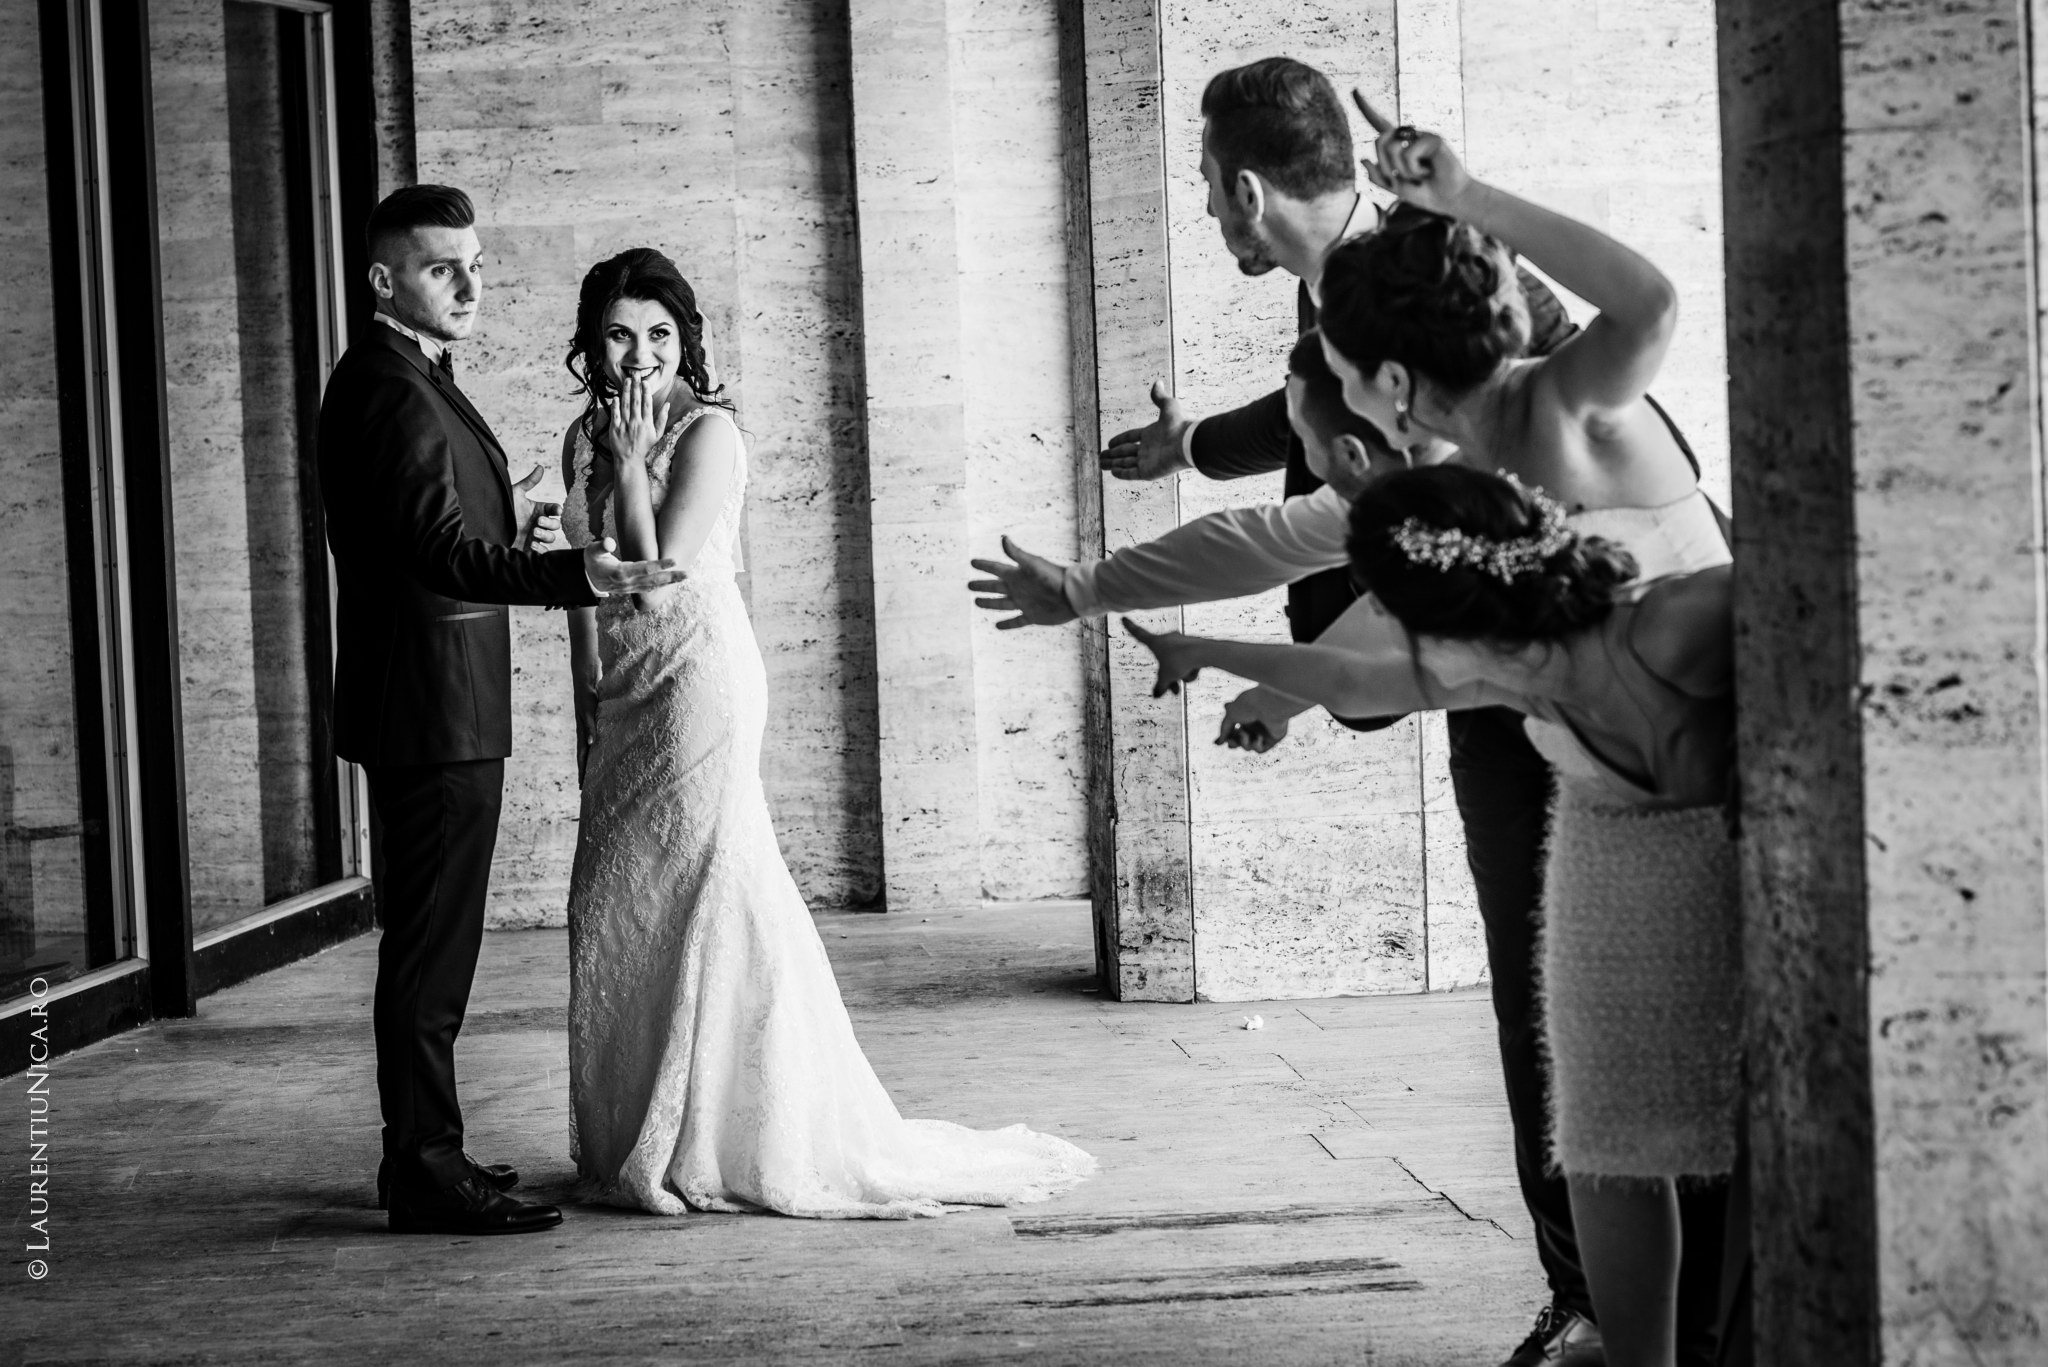 fotografii nunta craiova bia alex fotograf nunta laurentiu nica 29 - Bia & Alex | Fotografii nunta | Craiova